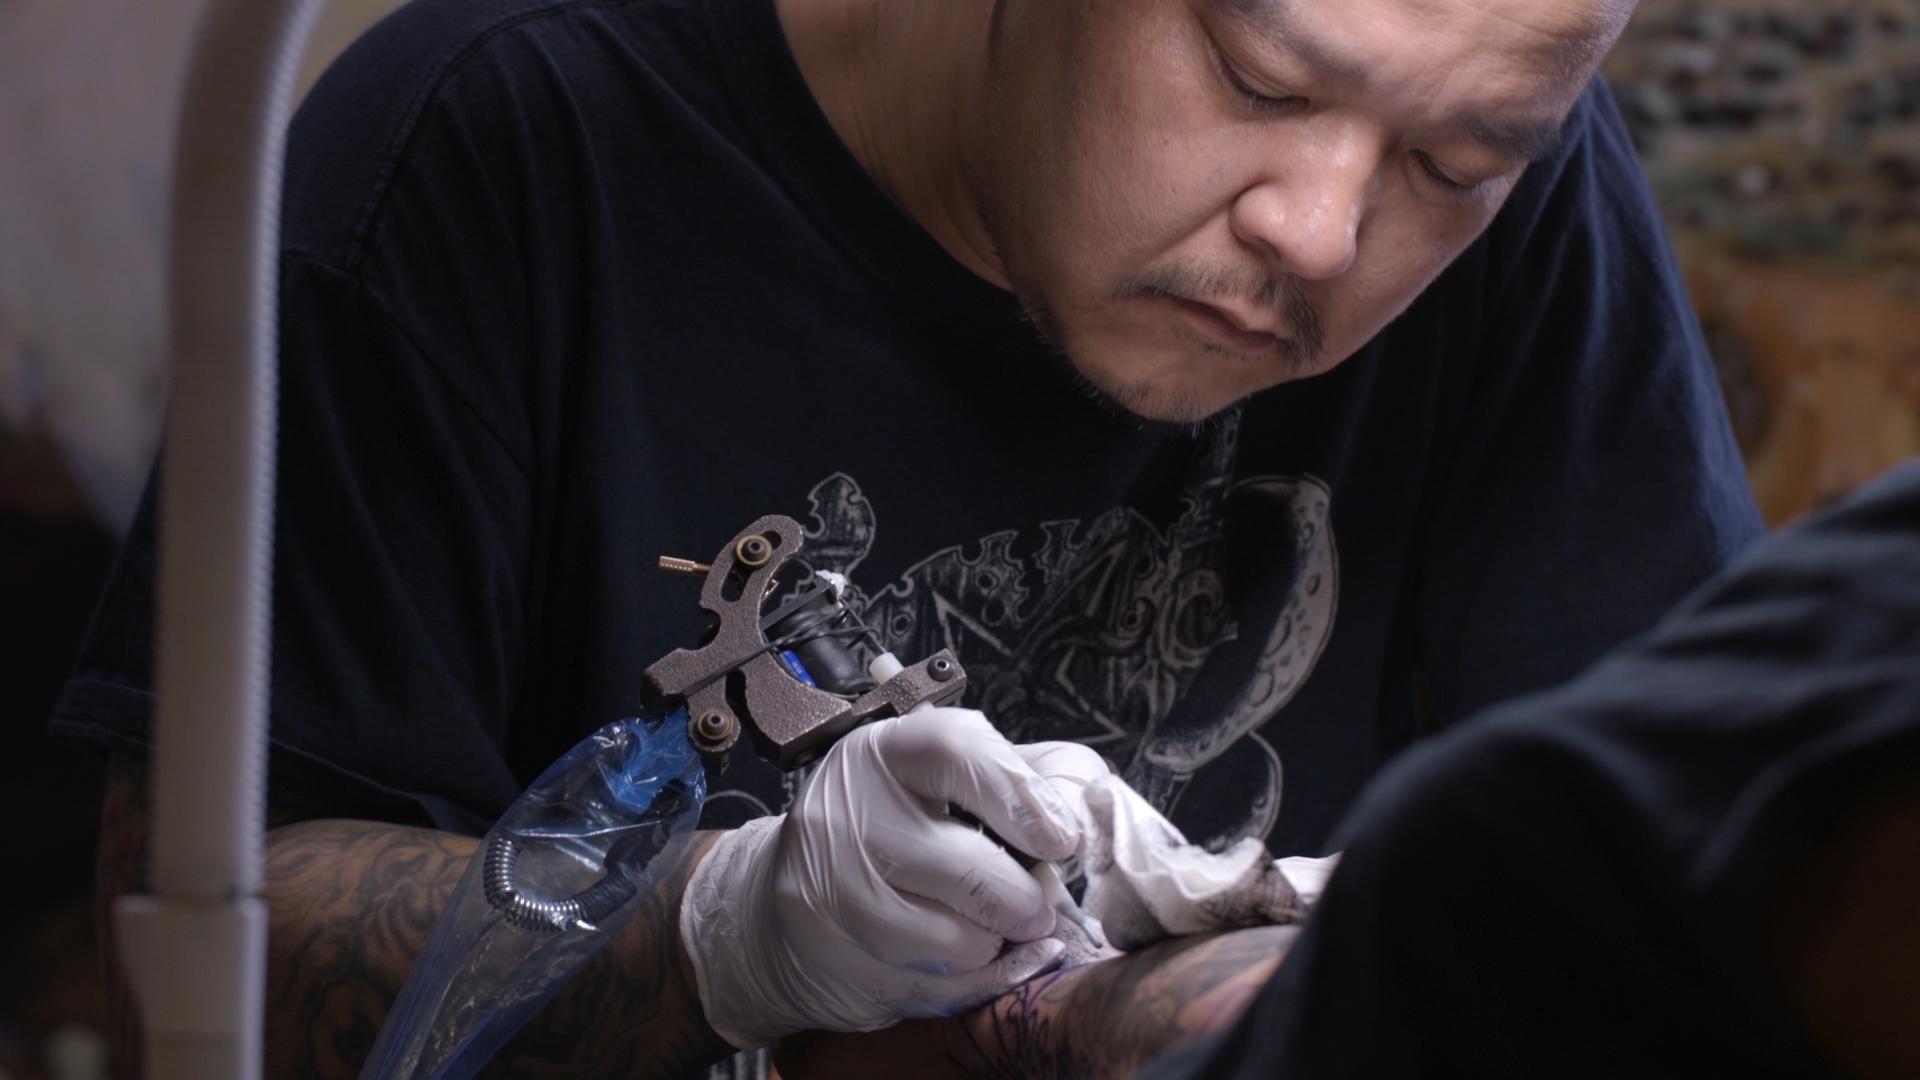 Horinao Tattooing